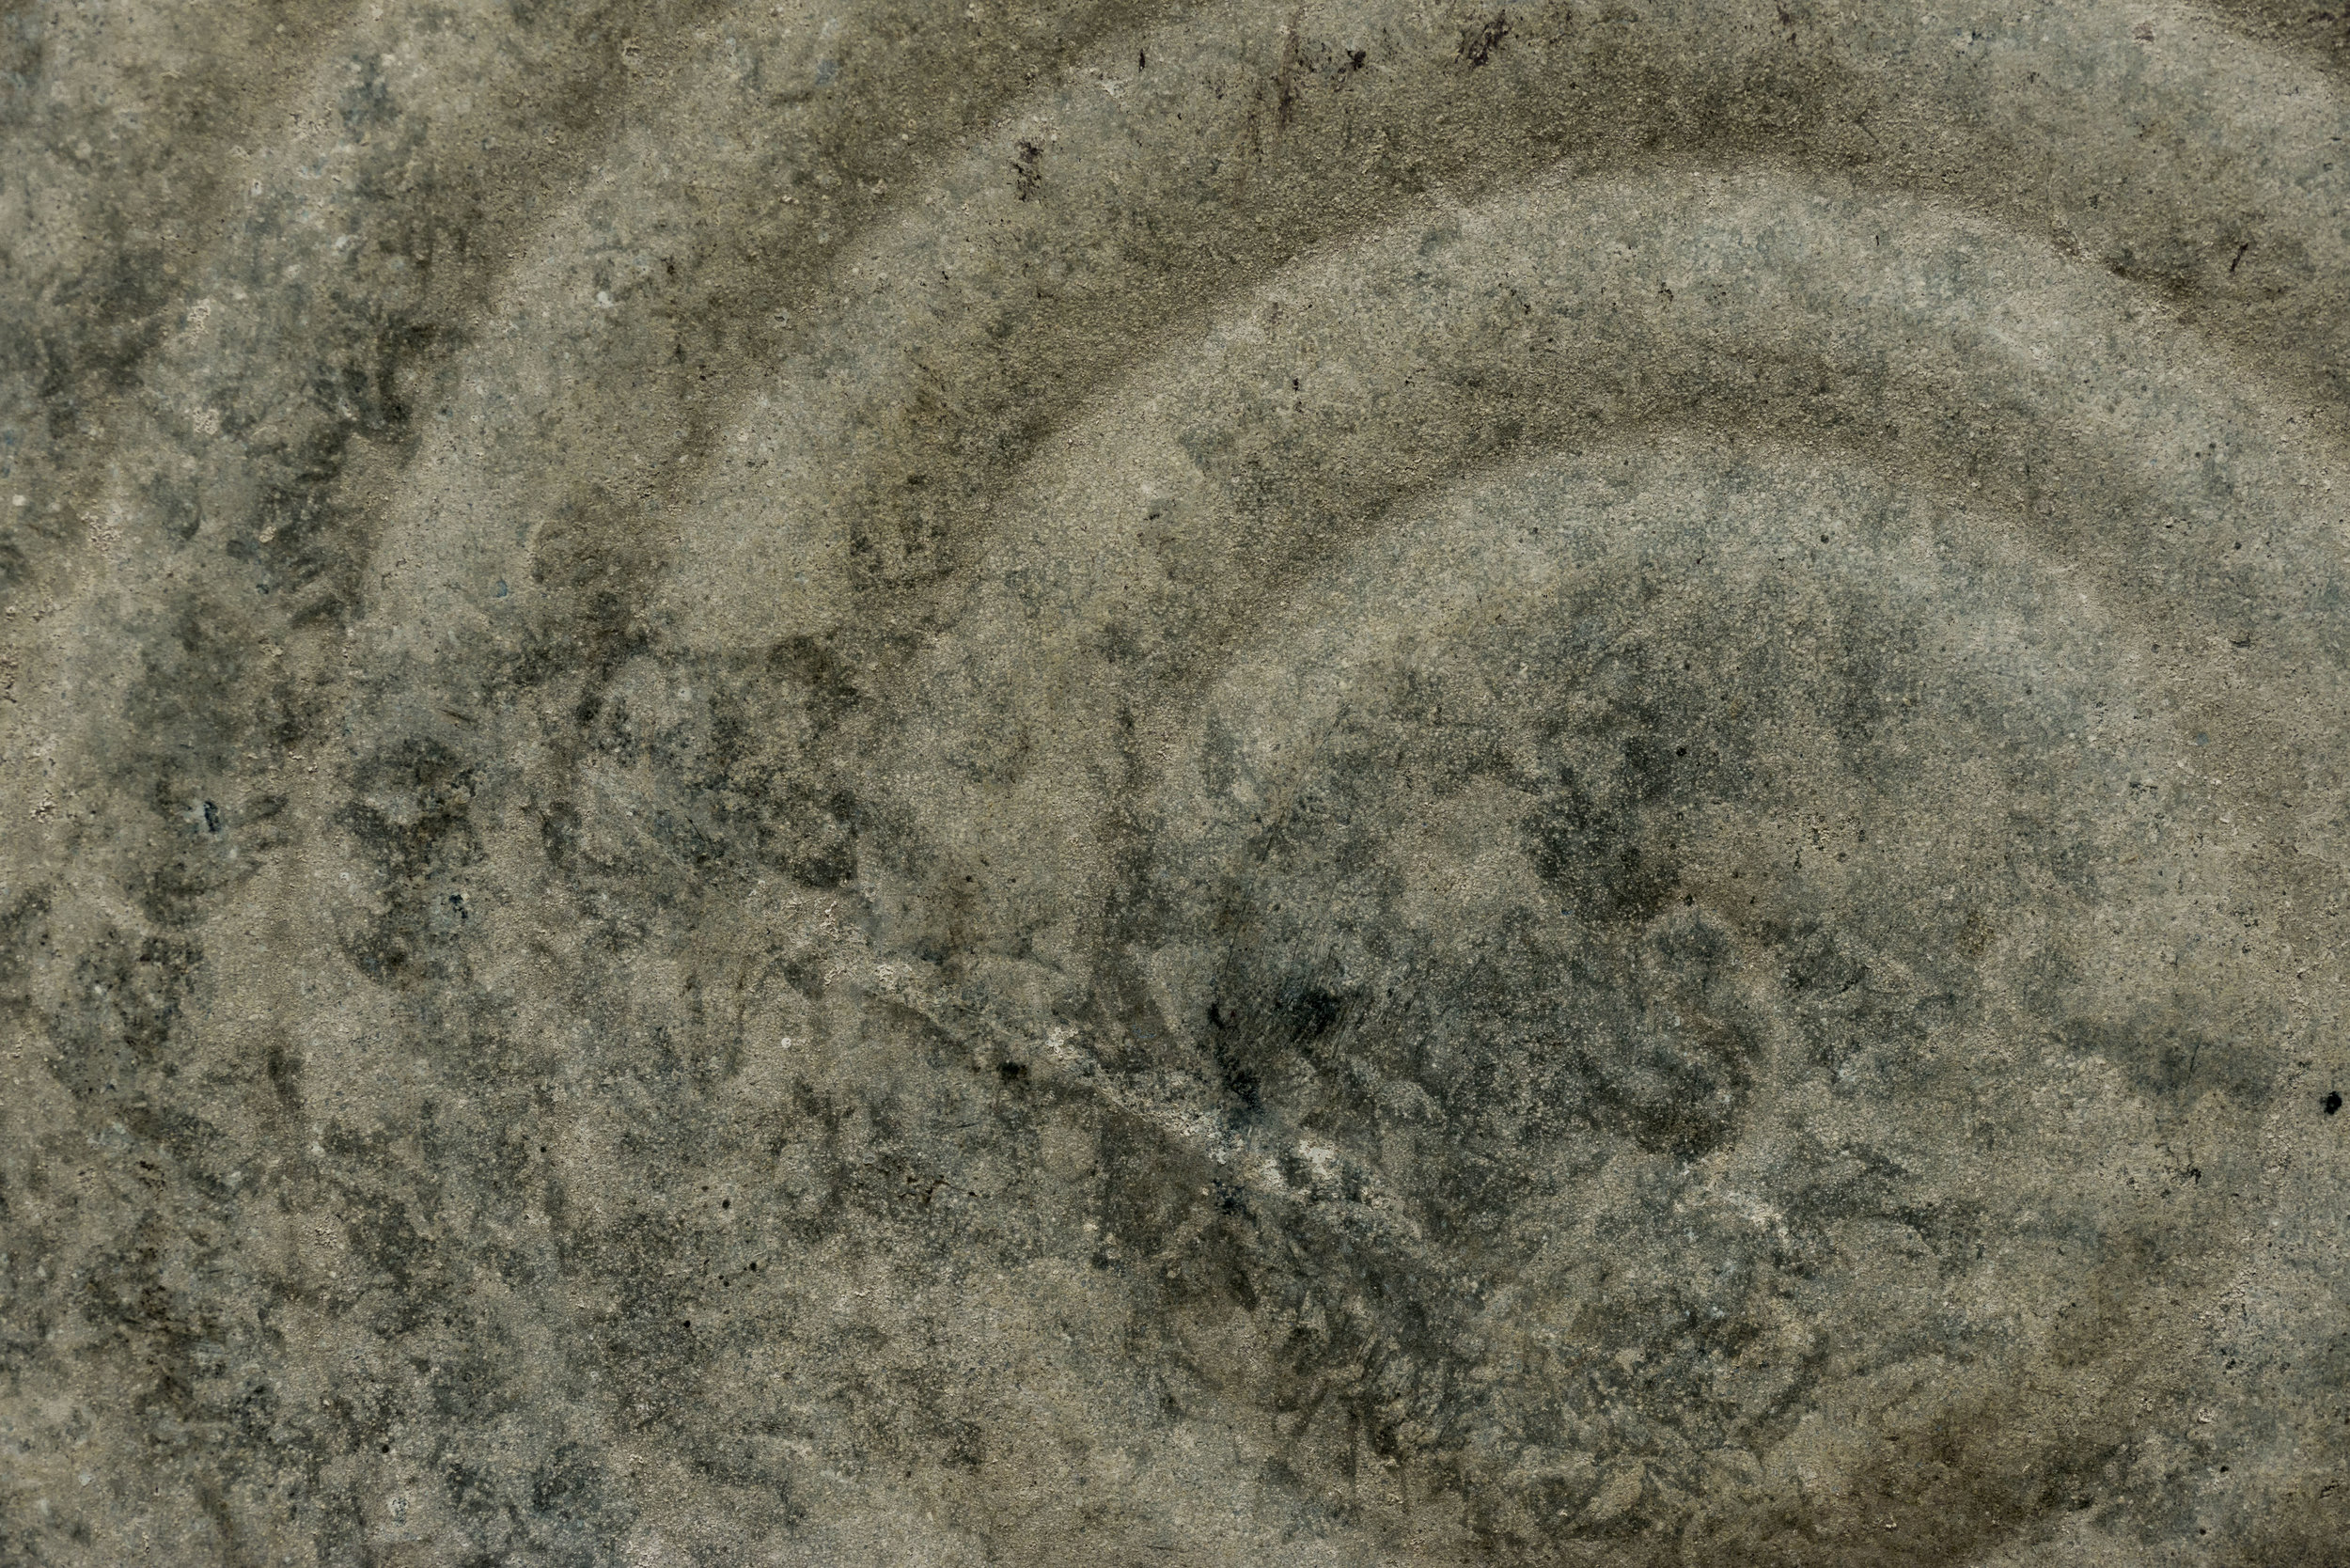 Bucket eye / Texture